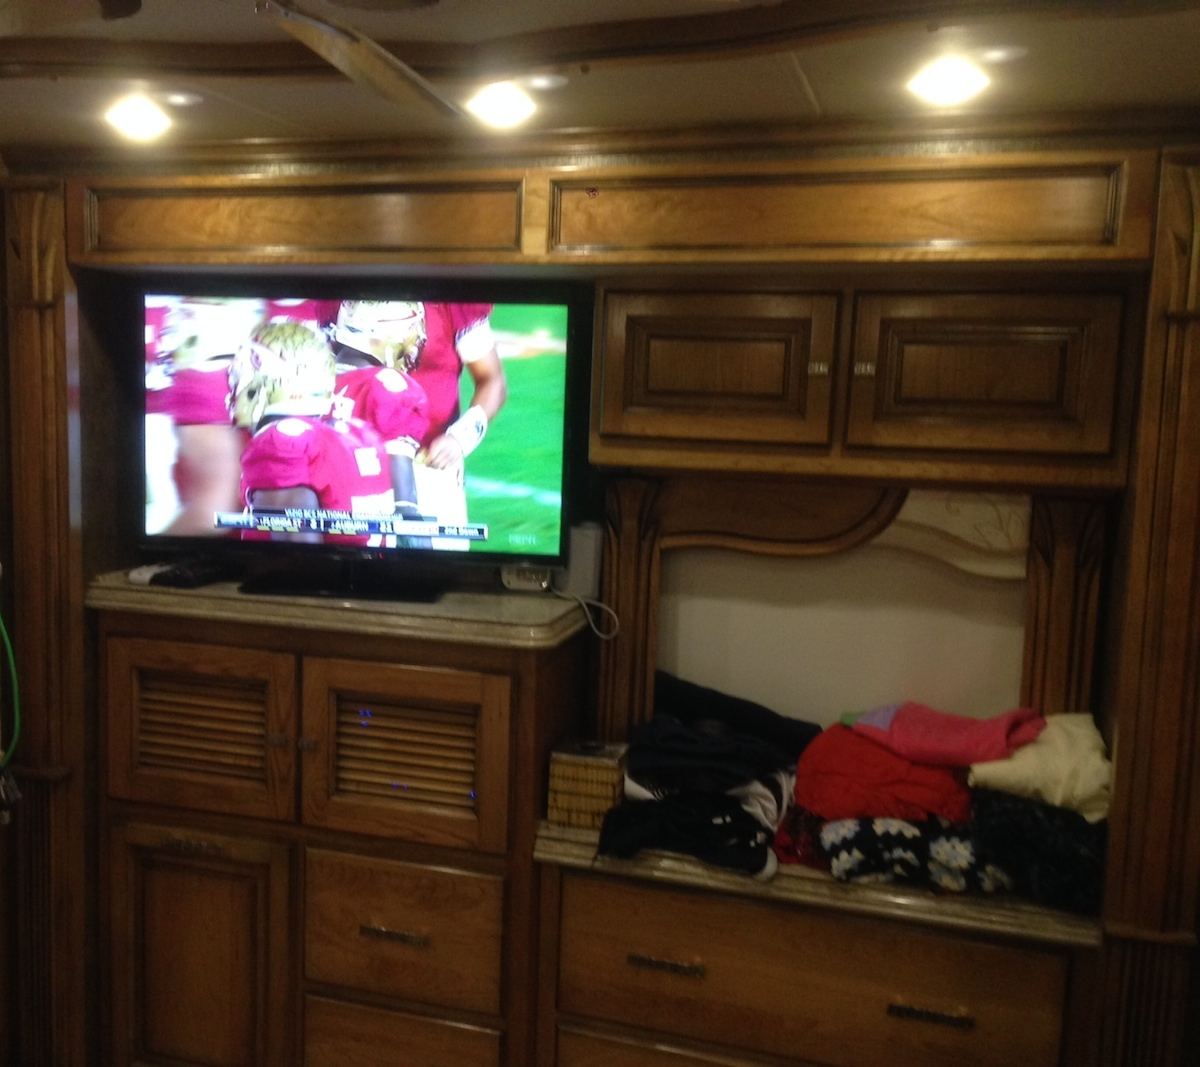 Click image for larger version  Name:Bedroom 42 inch TV Overhead Cabinets dresser Media Center and Hamper cabinetry.jpg Views:108 Size:333.0 KB ID:53493